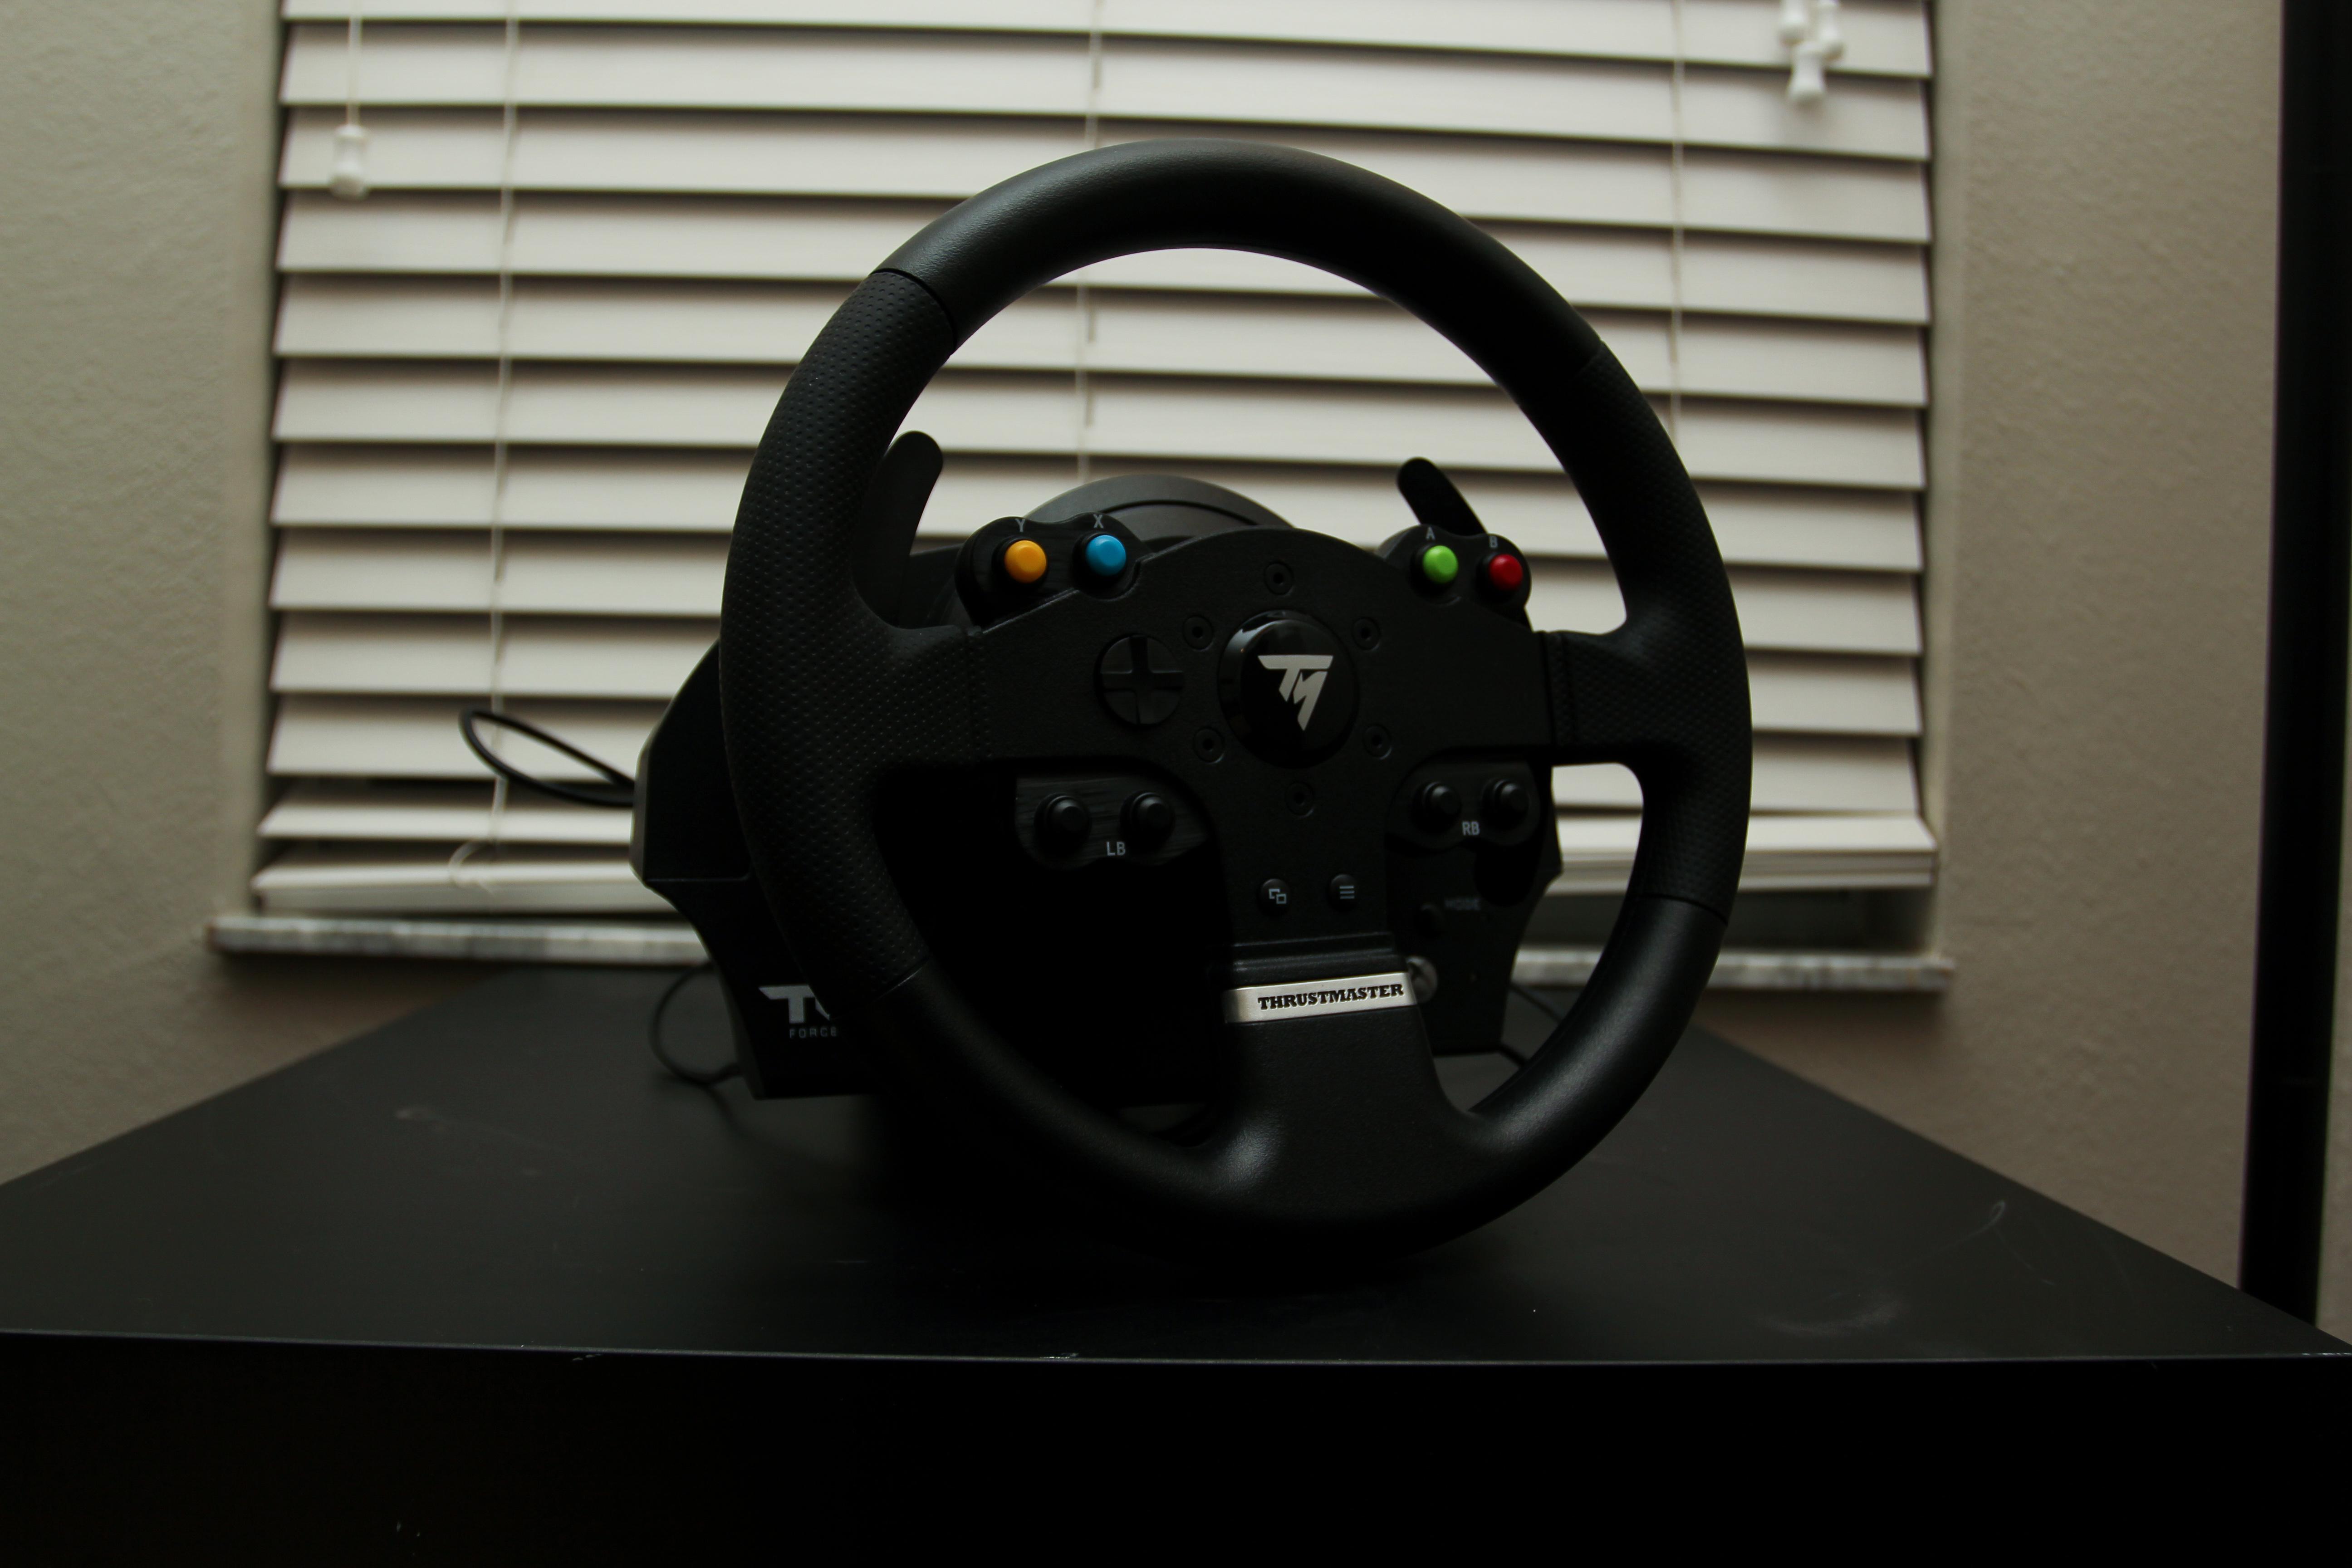 SOLD* Thrustmaster TMX Pro (Wheelbase + T3PA Pedals) - Sim Gear